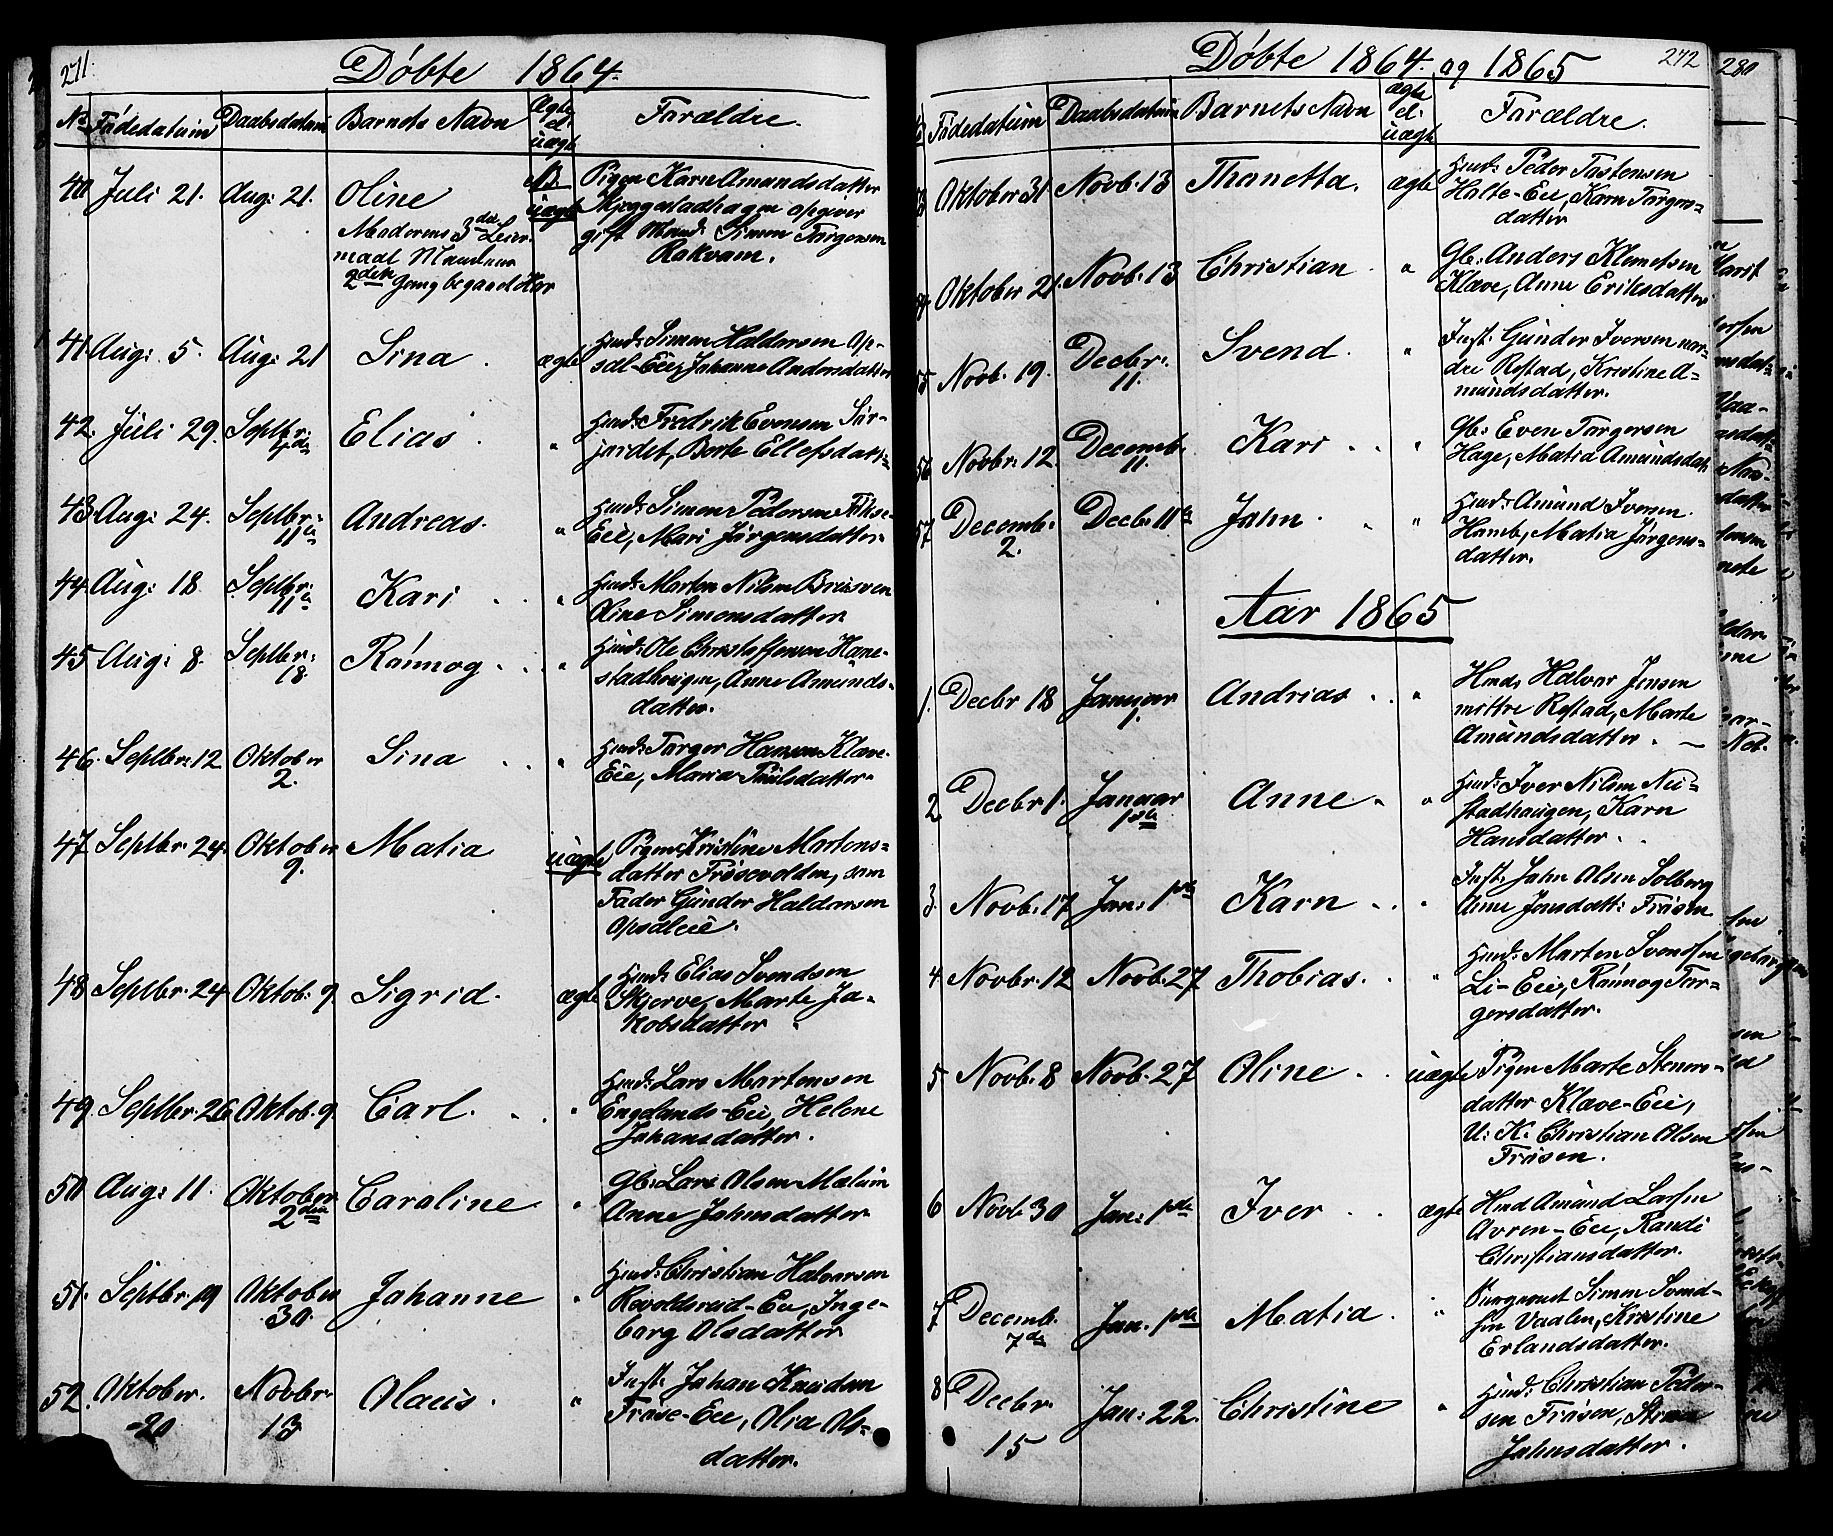 SAH, Østre Gausdal prestekontor, Klokkerbok nr. 1, 1863-1893, s. 271-272